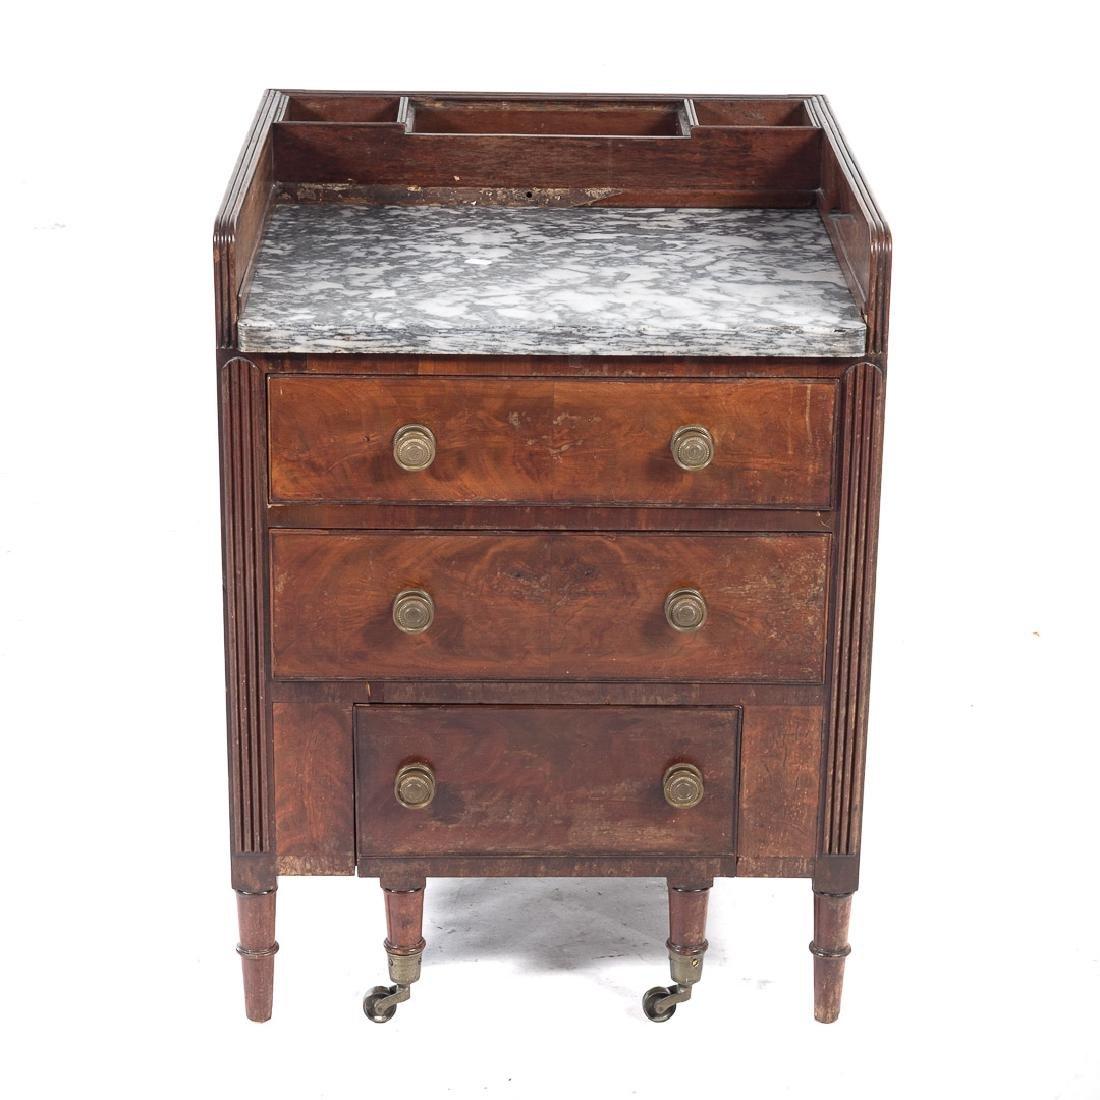 American Classical mahogany commode